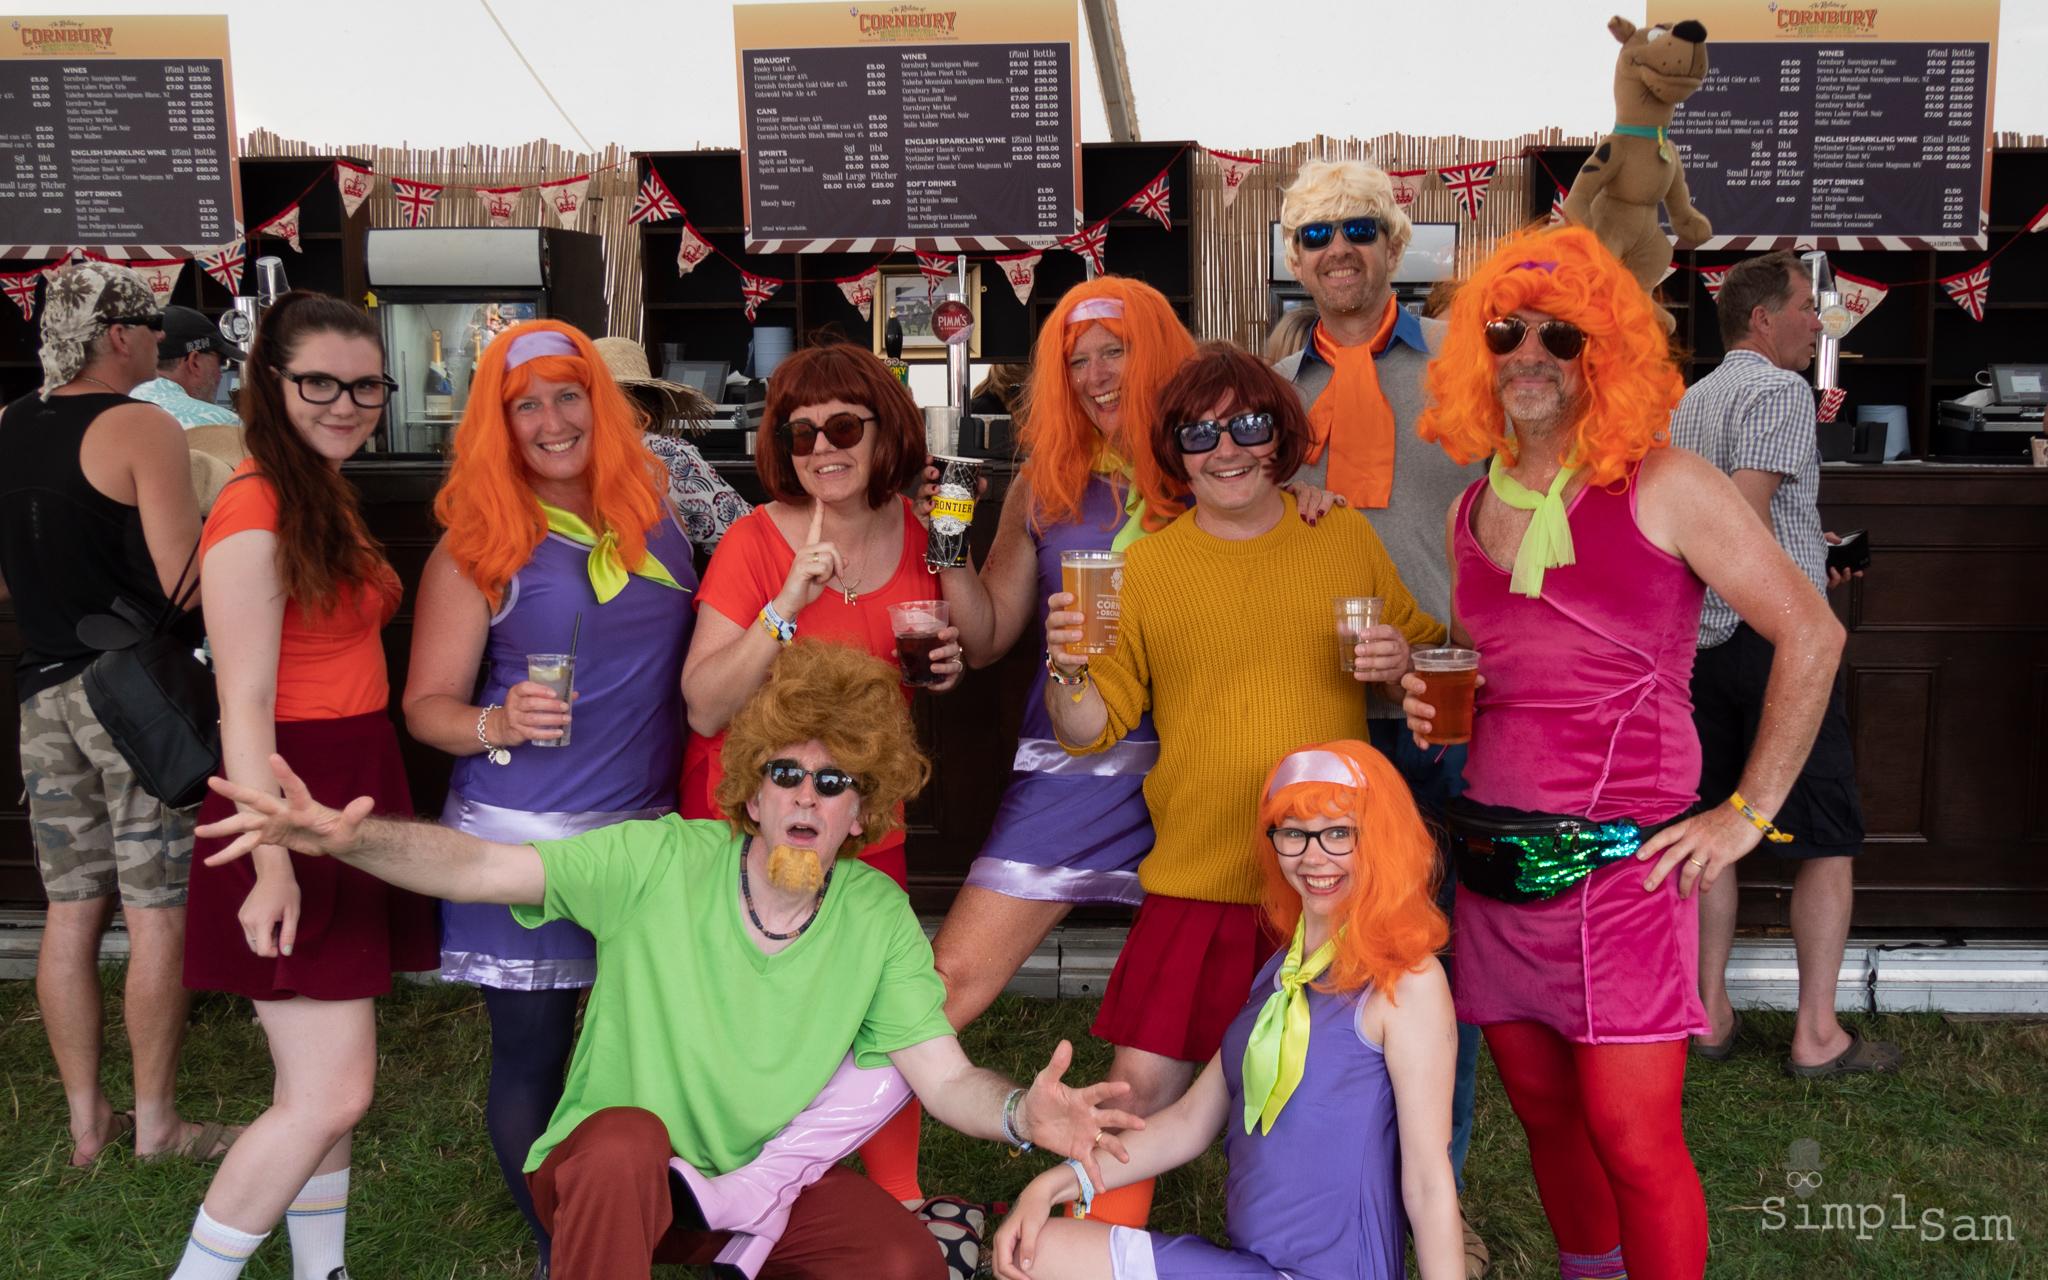 Cornbury Music Festival 2018 - Scooby Doo's